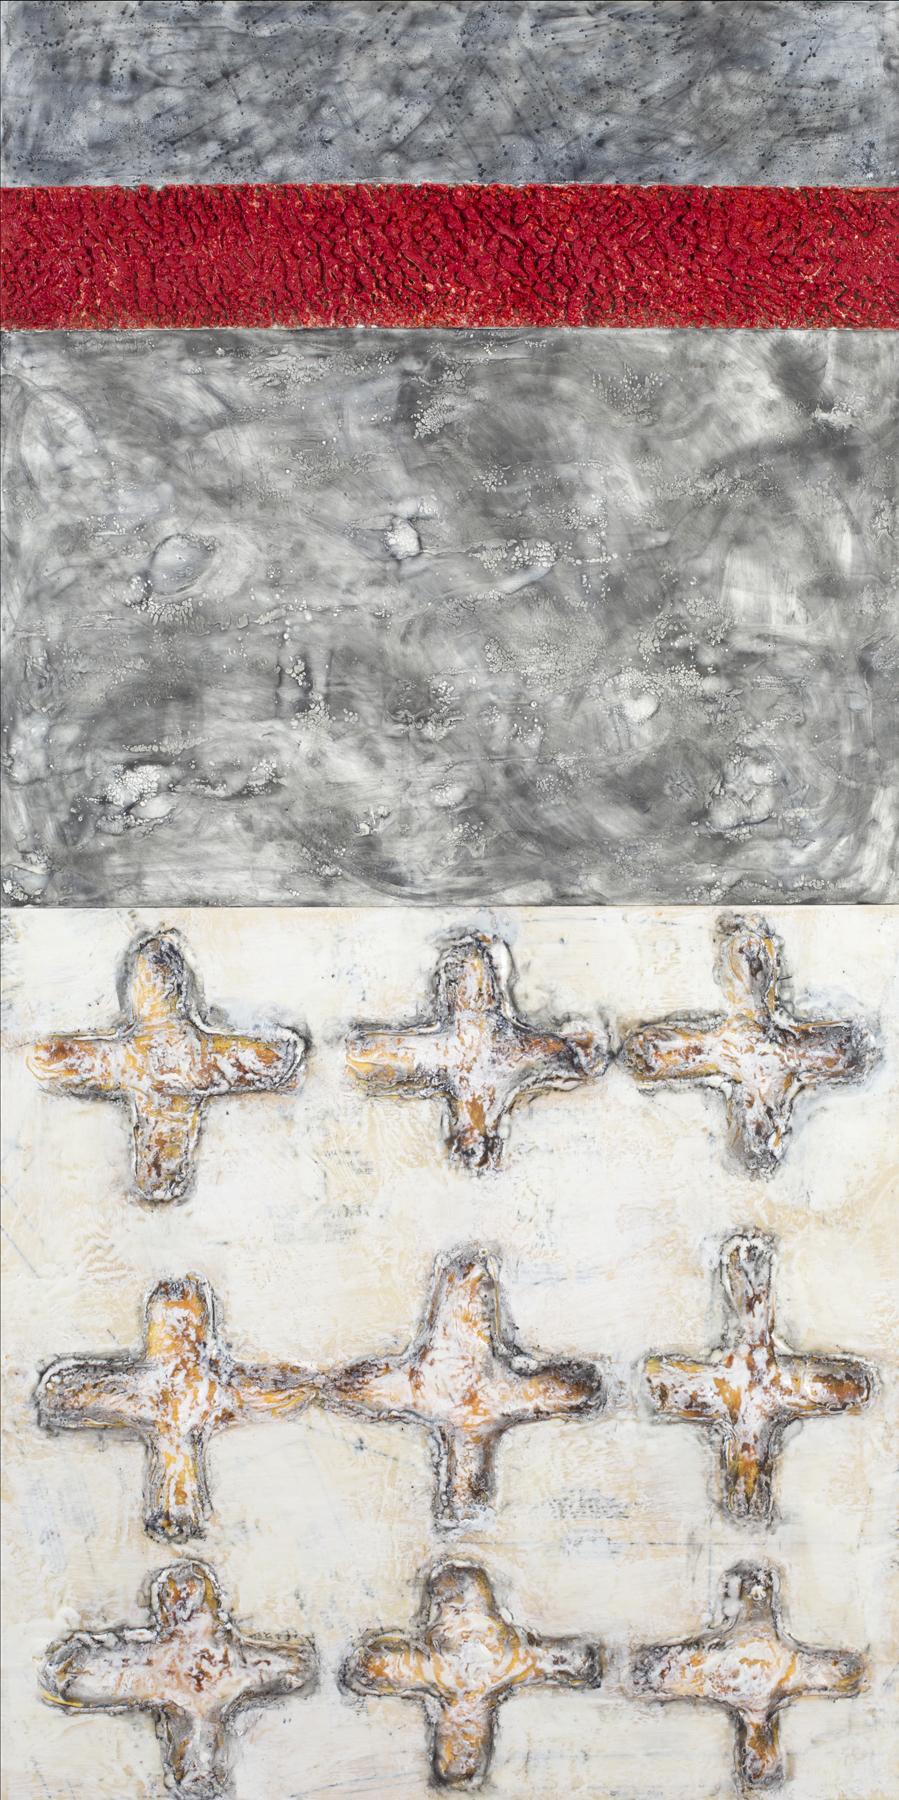 "Cruciform Deconstruction 1 encaustic, graphite, wood glue, sewing patterns, 24x48"""